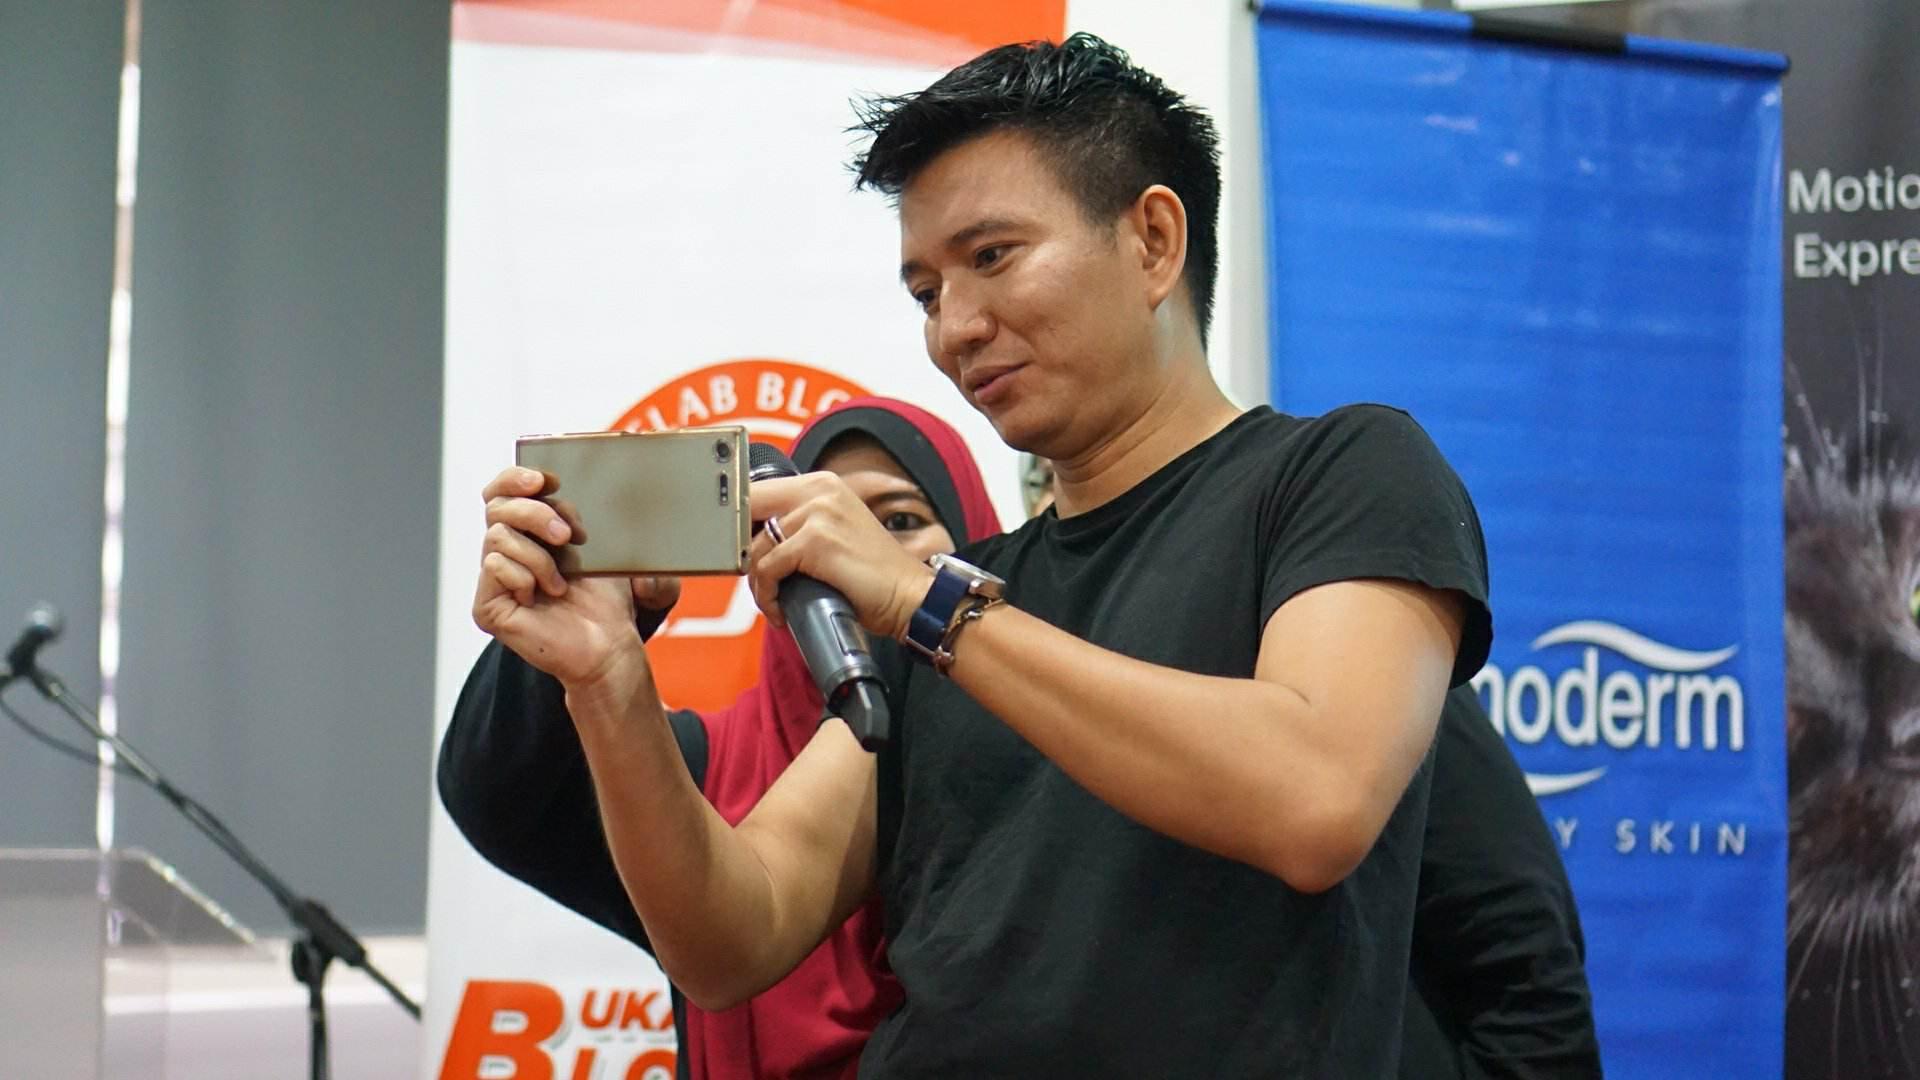 BELAJAR MANUAL MODE GUNA SMARTPHONE!! BENGKEL FOTOFON KELAB BLOGGER BEN ASHAARI (74)